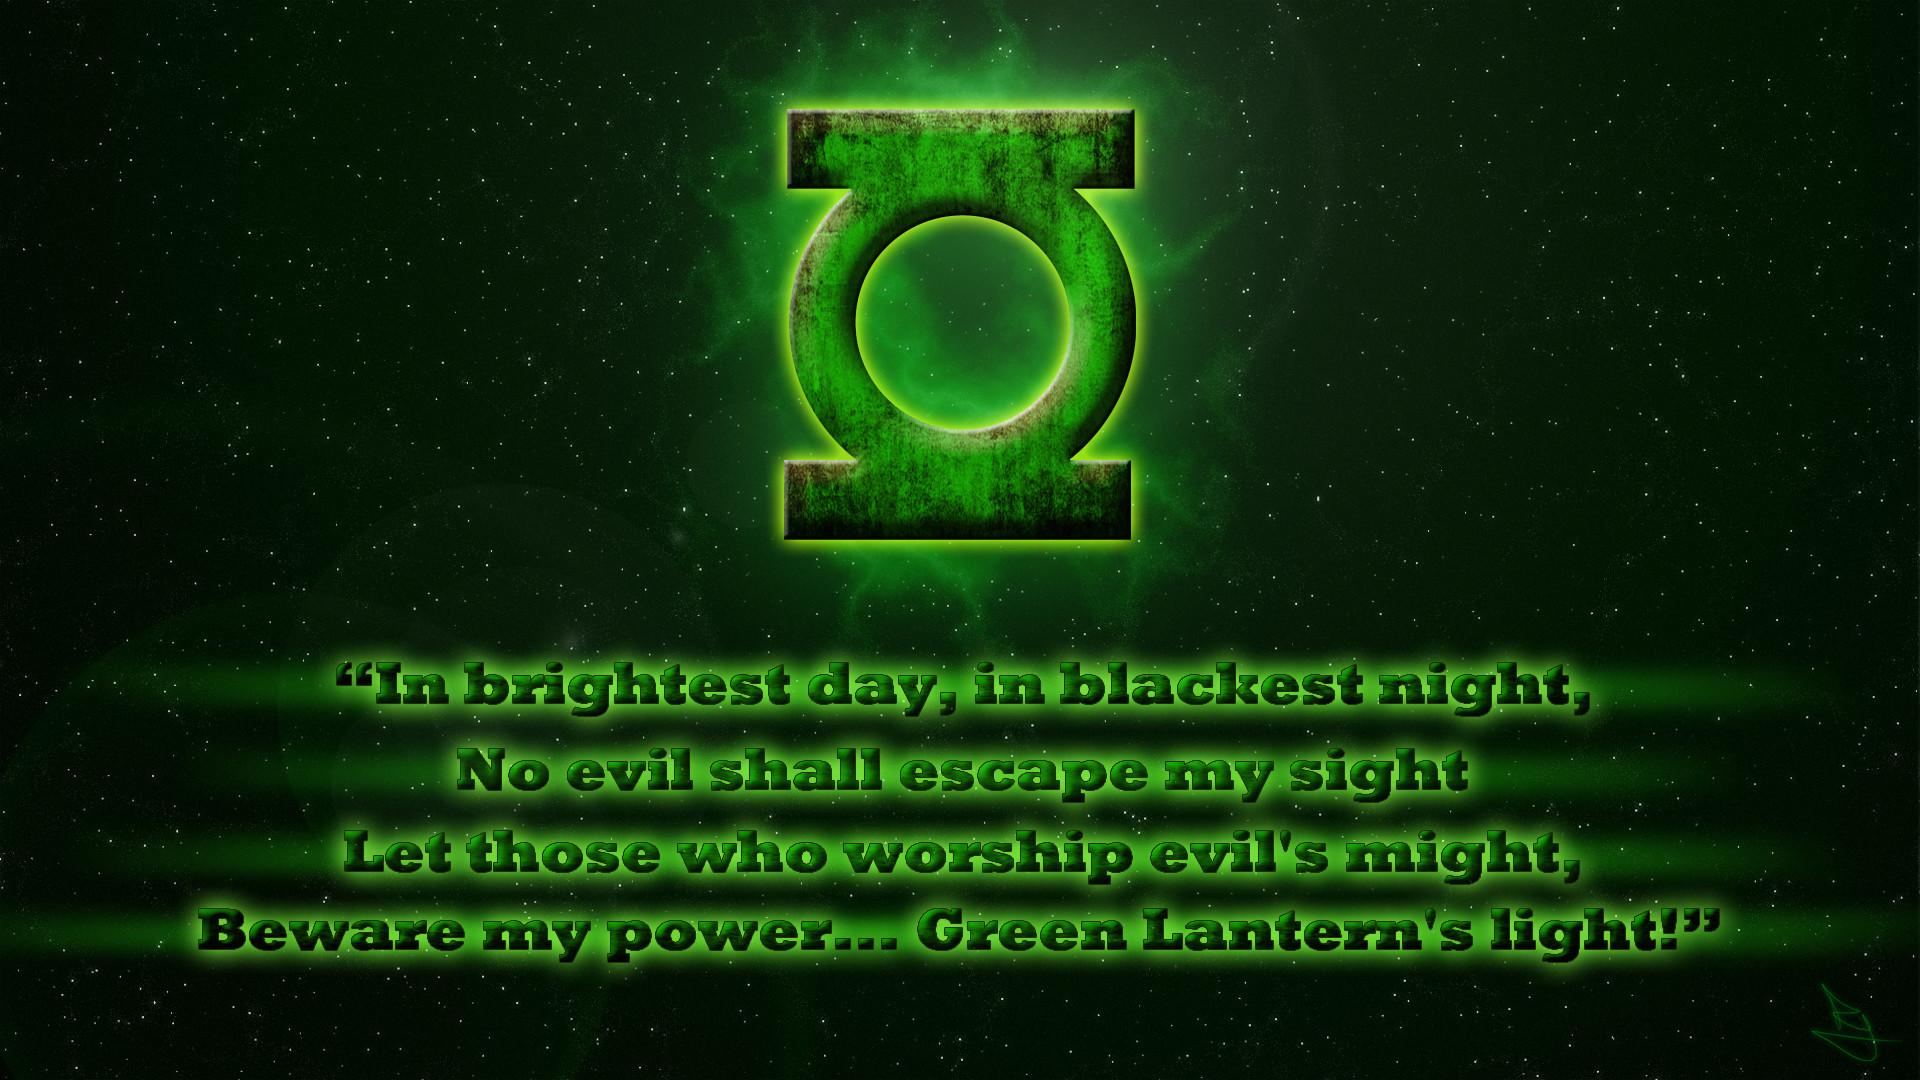 Green lantern oath – photo#1